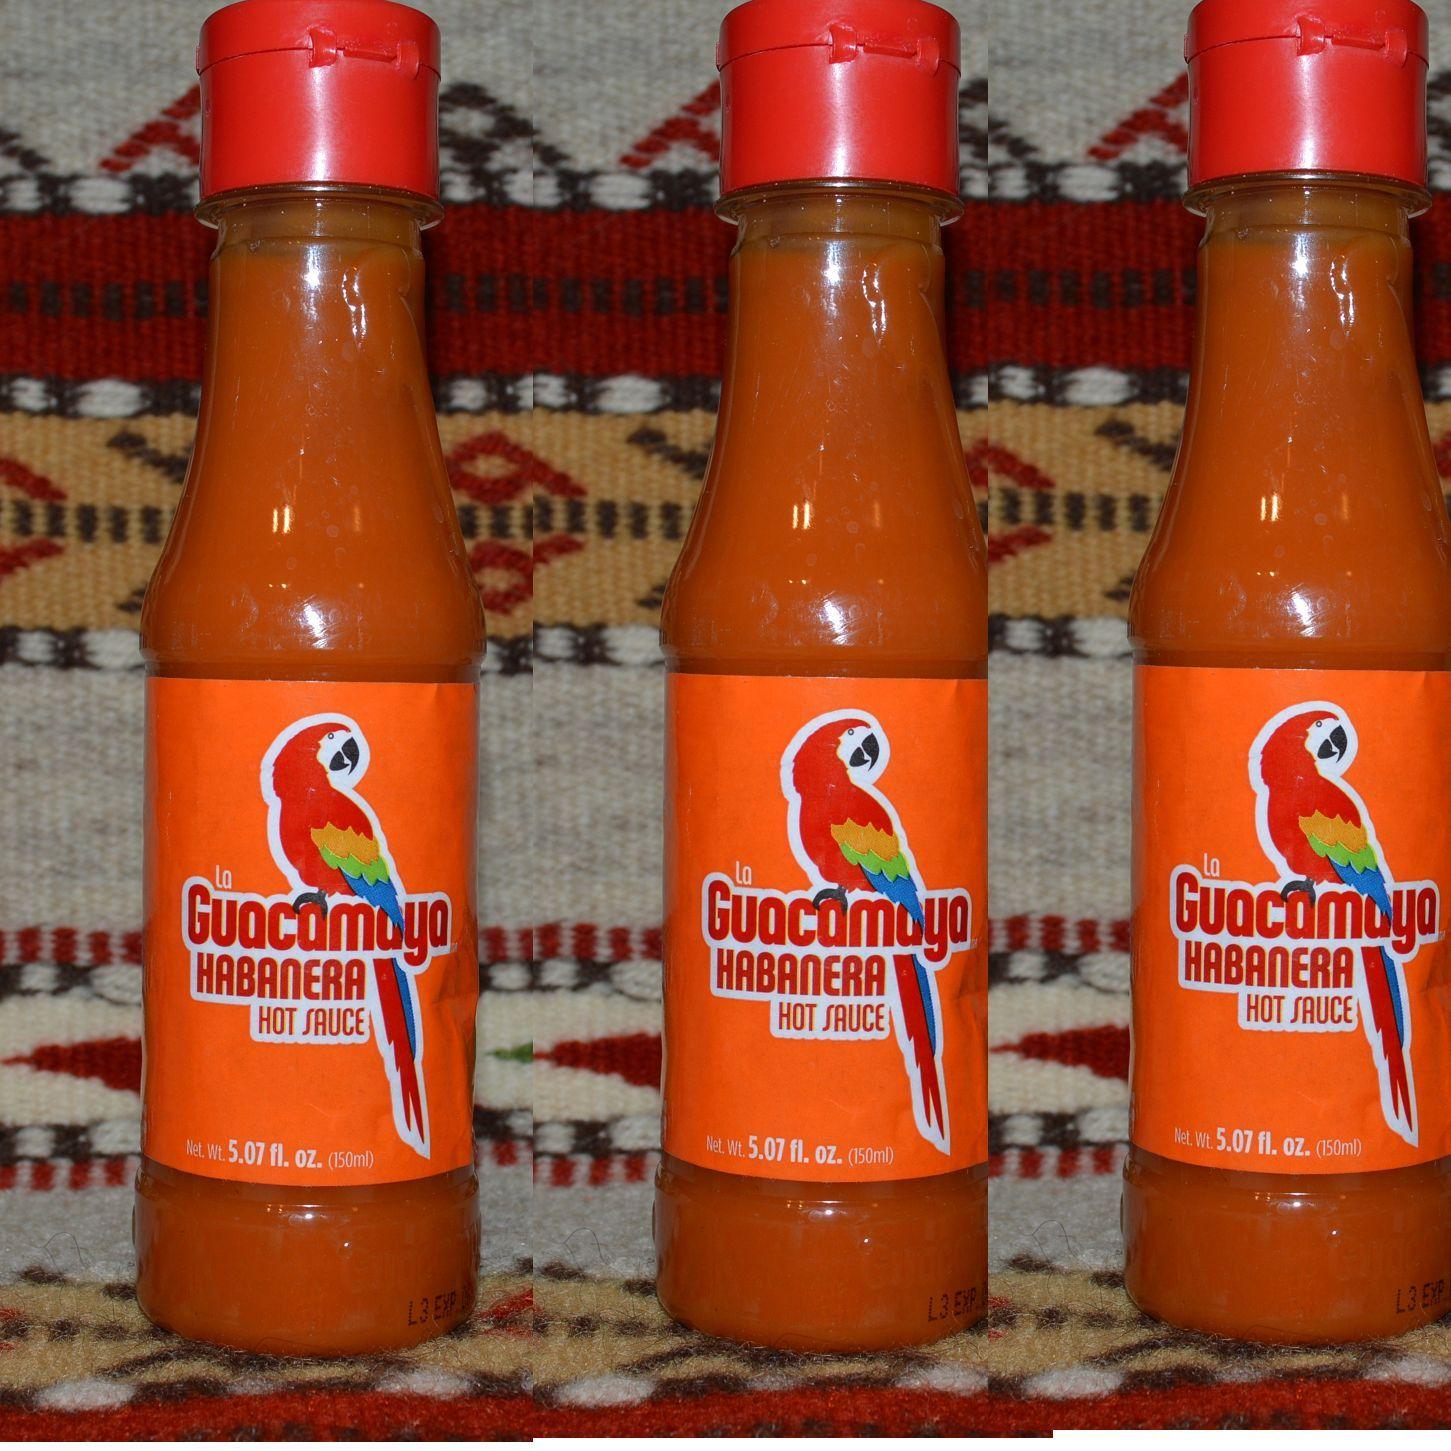 3 La Guacamaya Extra Hot Authentic Mexican Habanera Hot